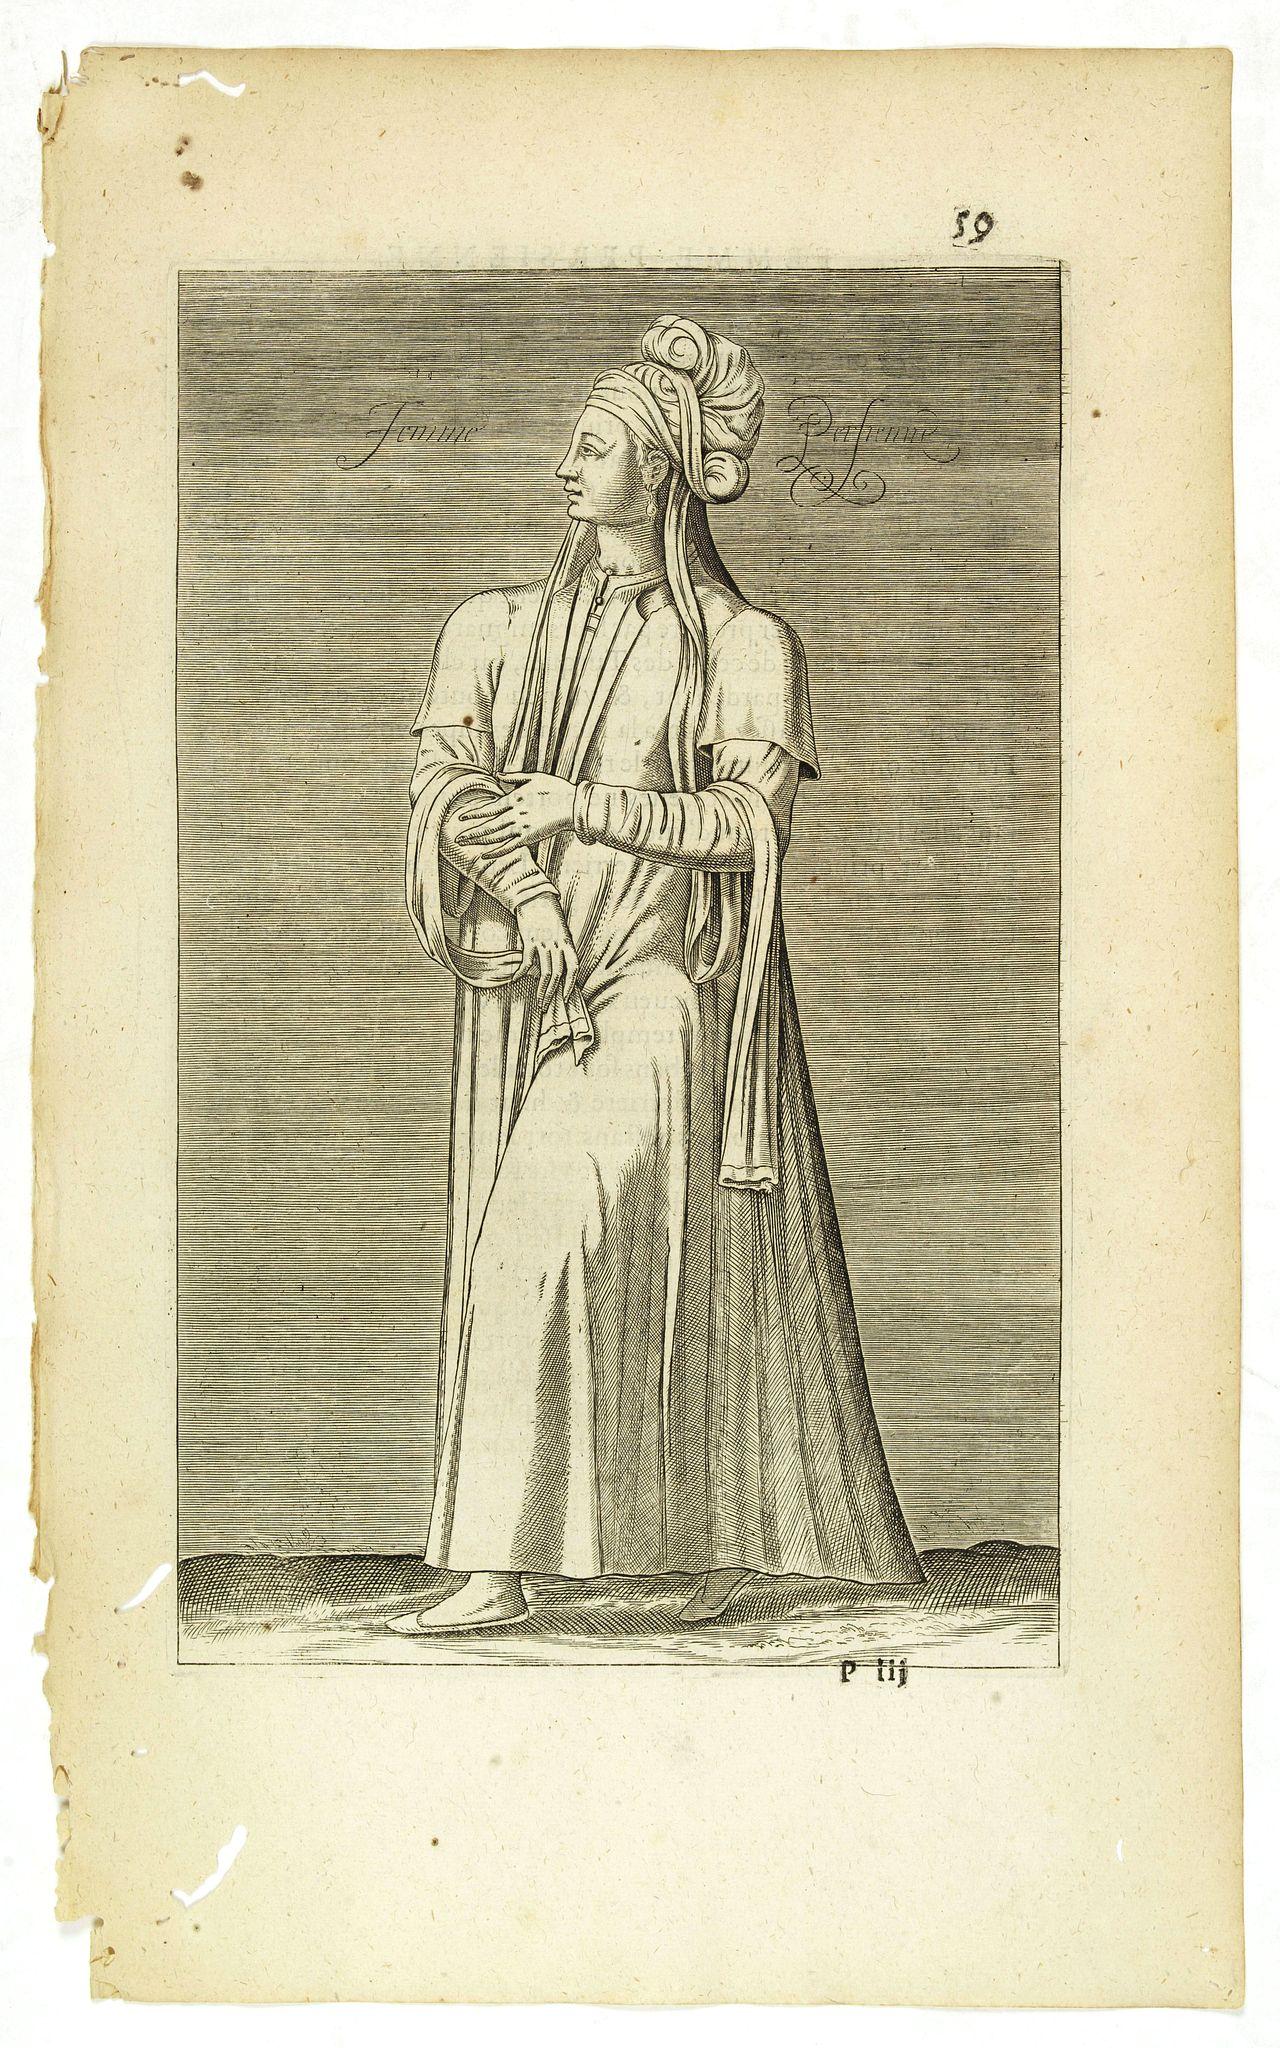 NICOLAS DE NICOLAY, Thomas Artus (sieur d'Embry). -  Femme Persienne. (59)